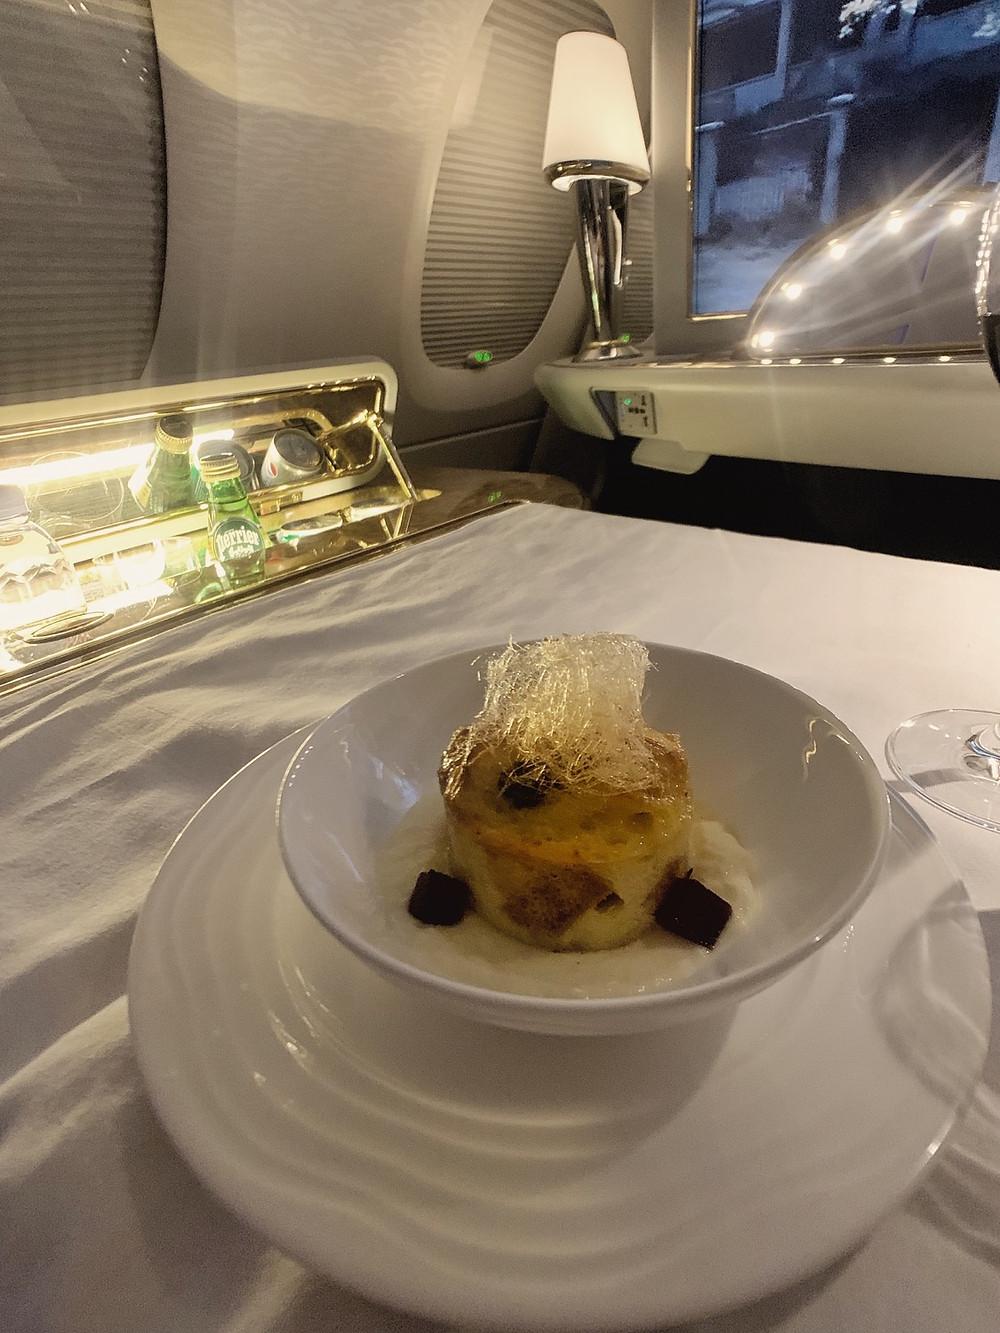 Emirates First Class San Francisco - Dubai, Bread Pudding Dessert